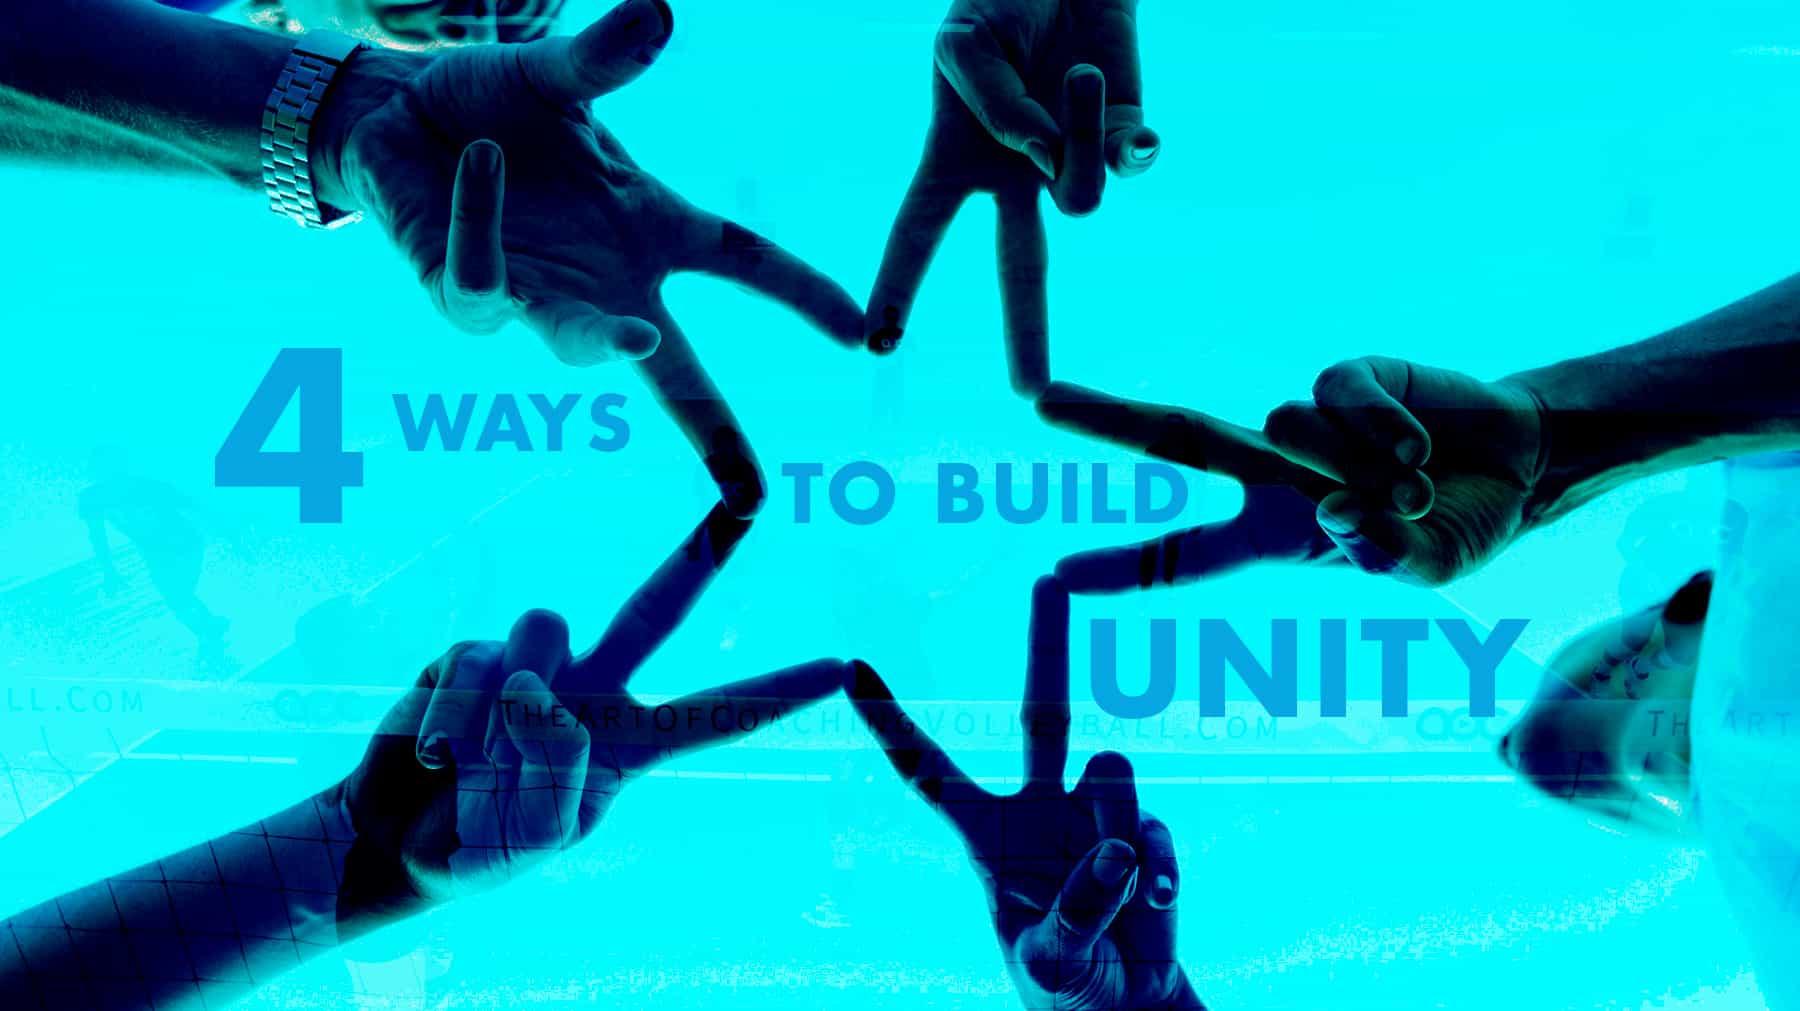 4 Ways to Build Unity